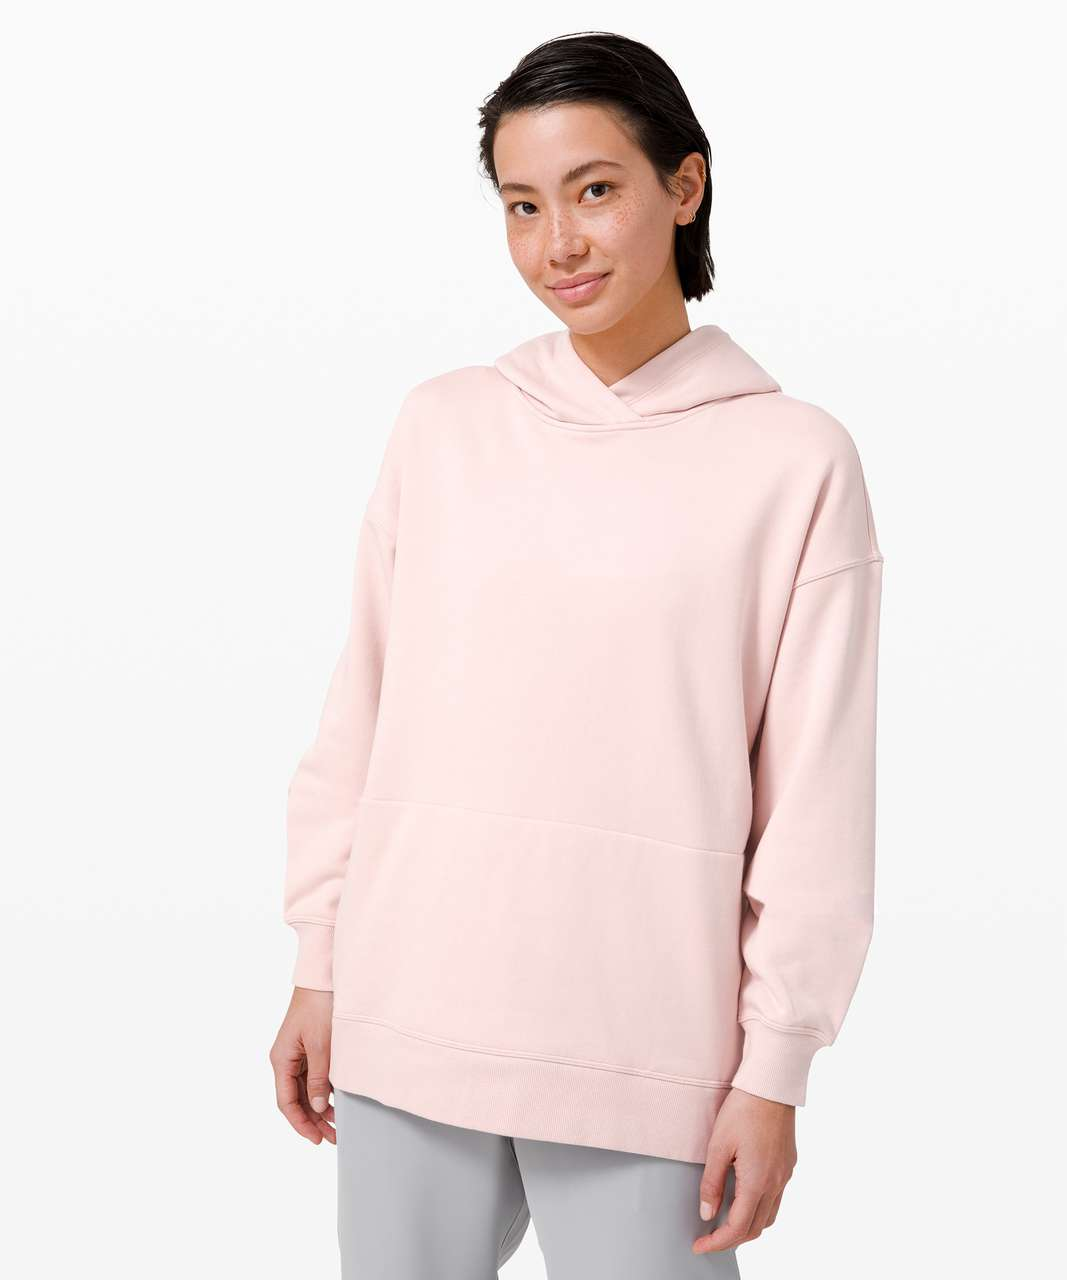 Lululemon Perfectly Oversized Hoodie - Pink Bliss